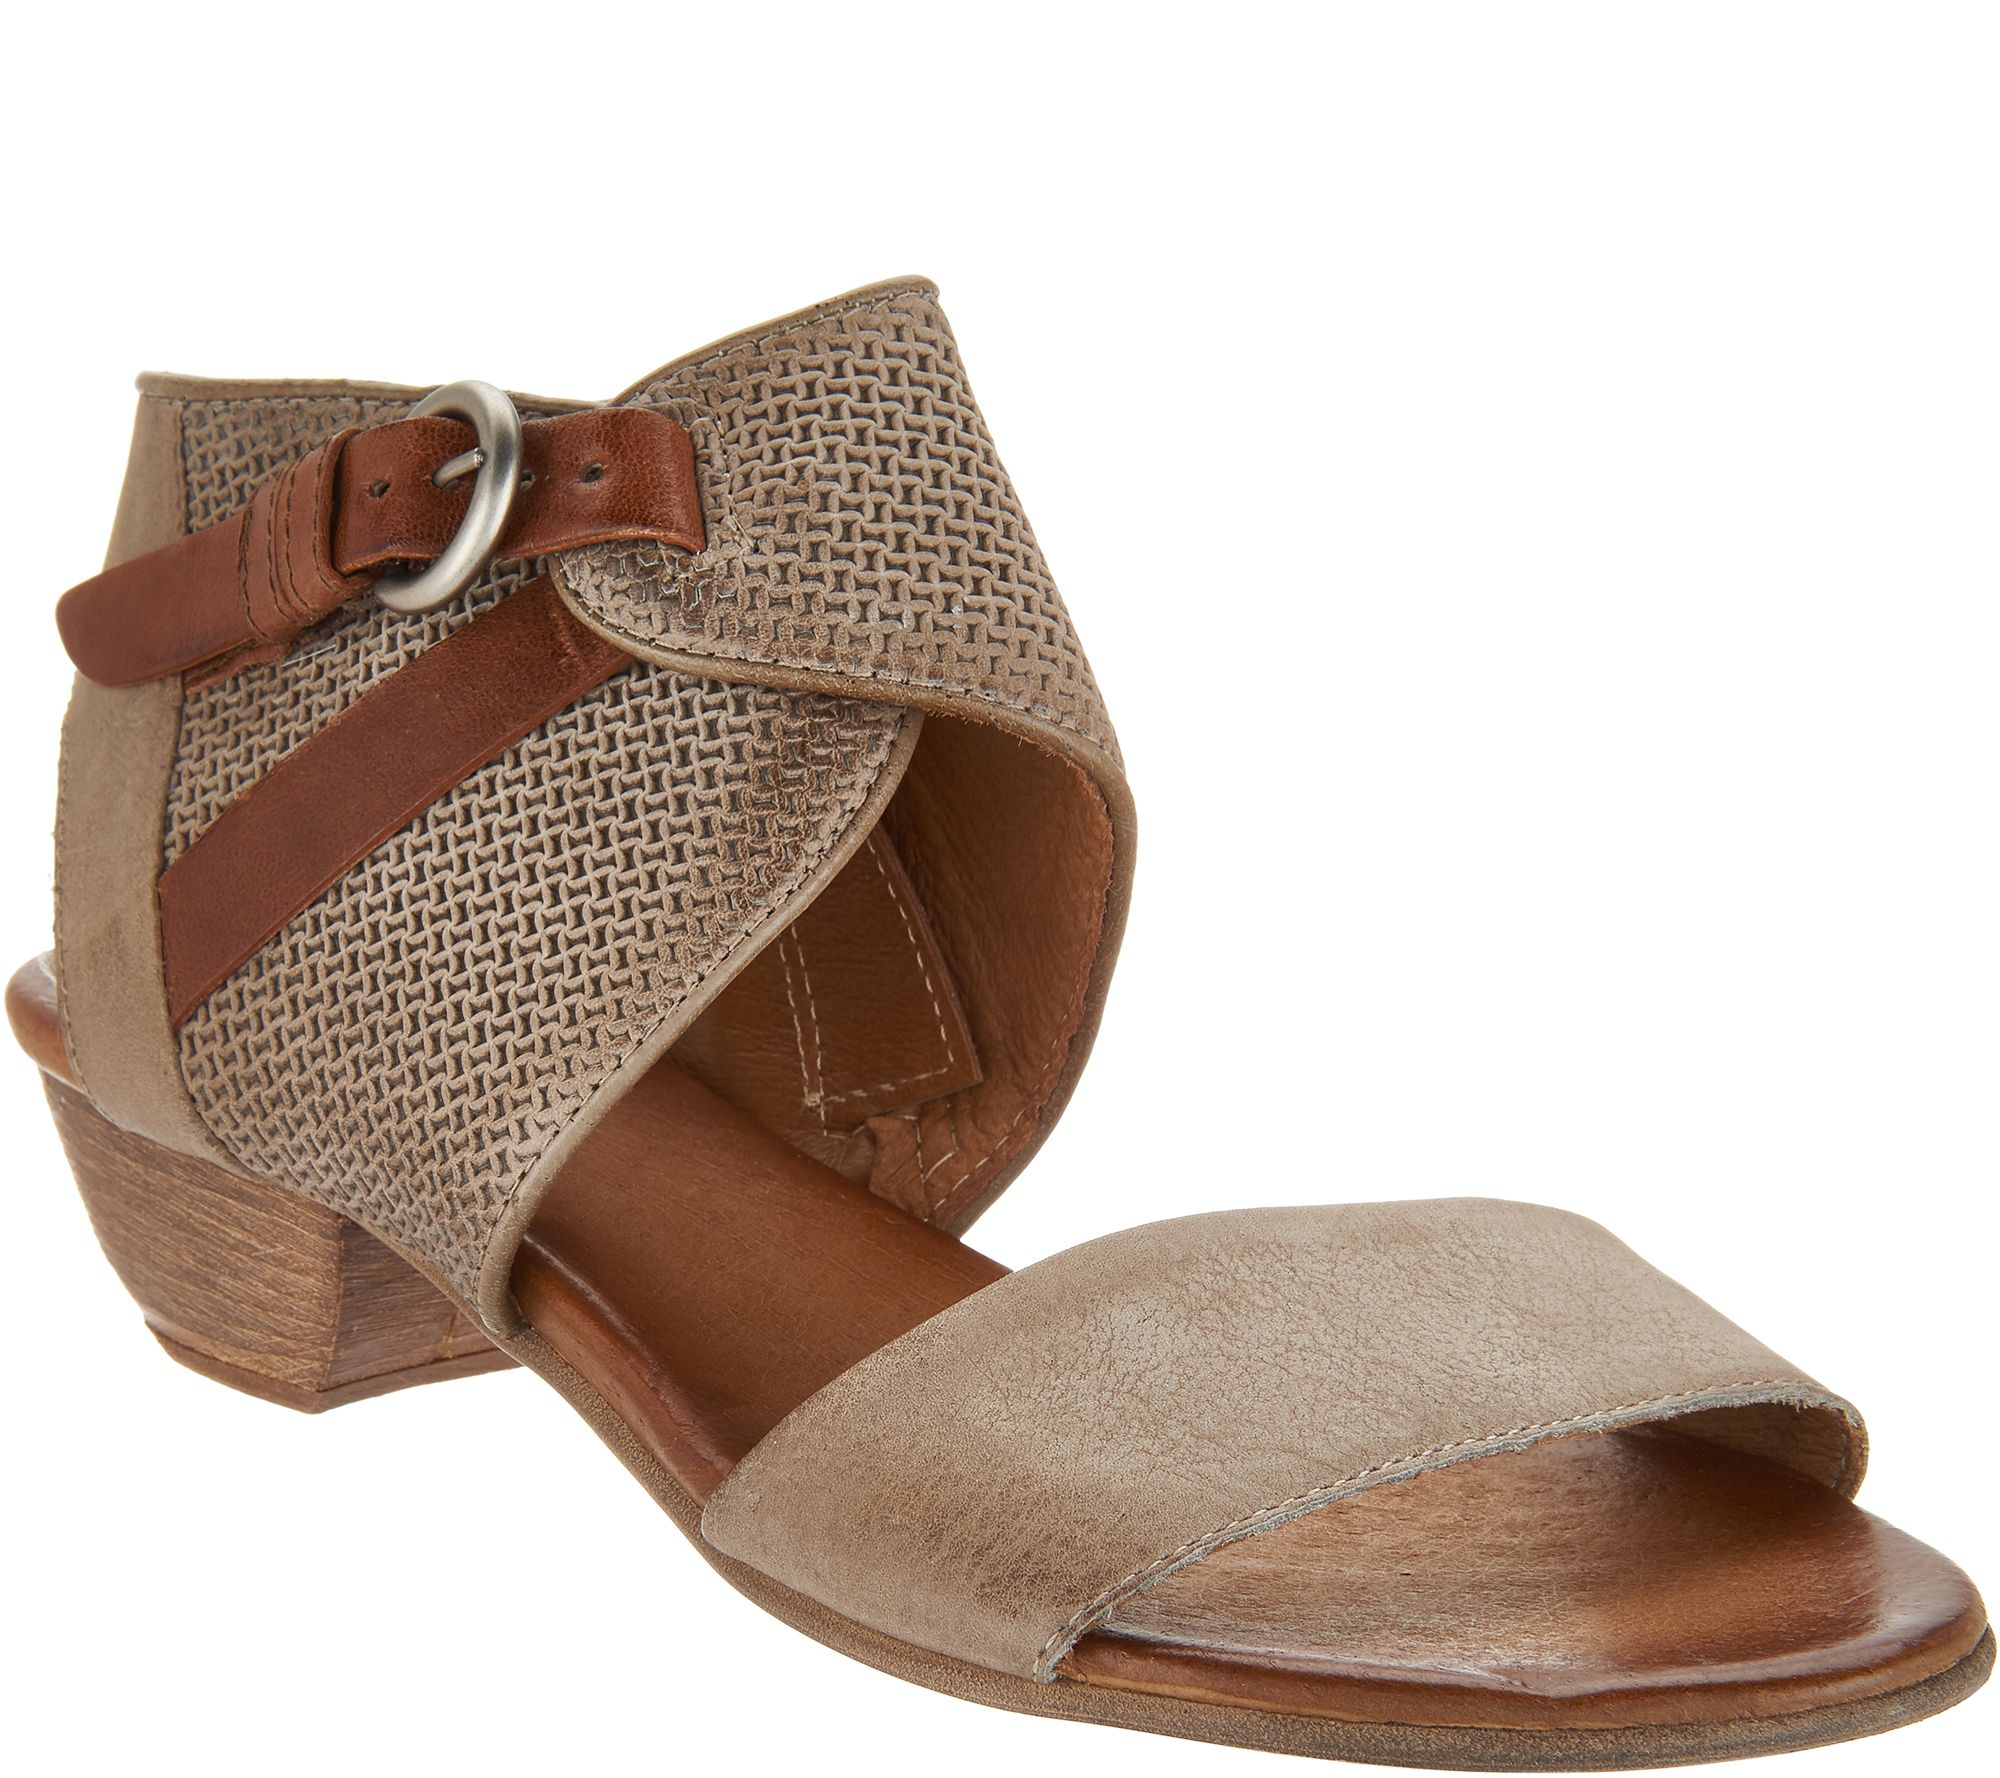 a8c78e7f831e Miz Mooz Leather Buckle Sandals - Cheerful - Page 1 — QVC.com